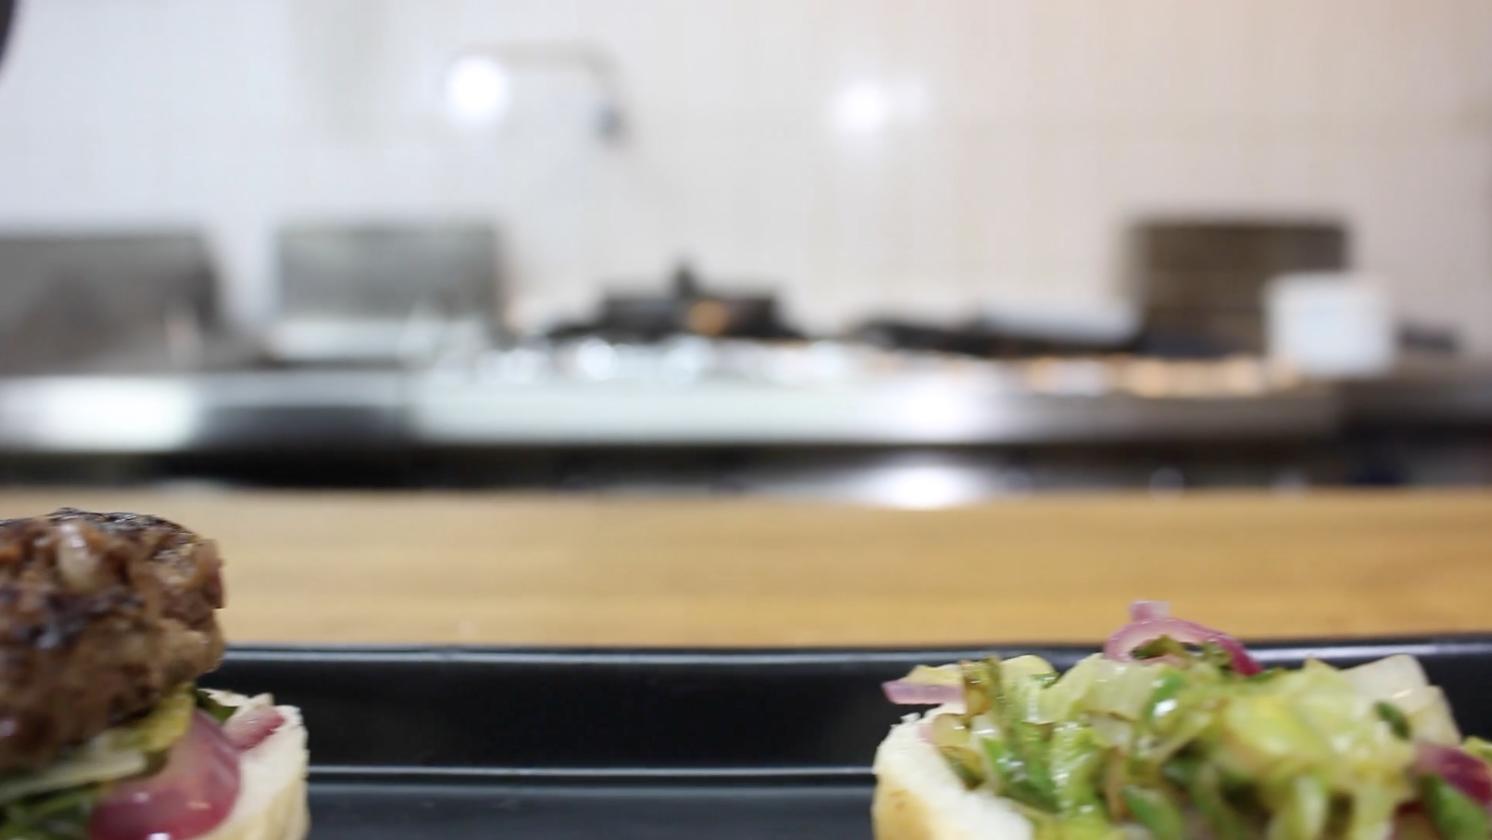 Burger Flipping Startup